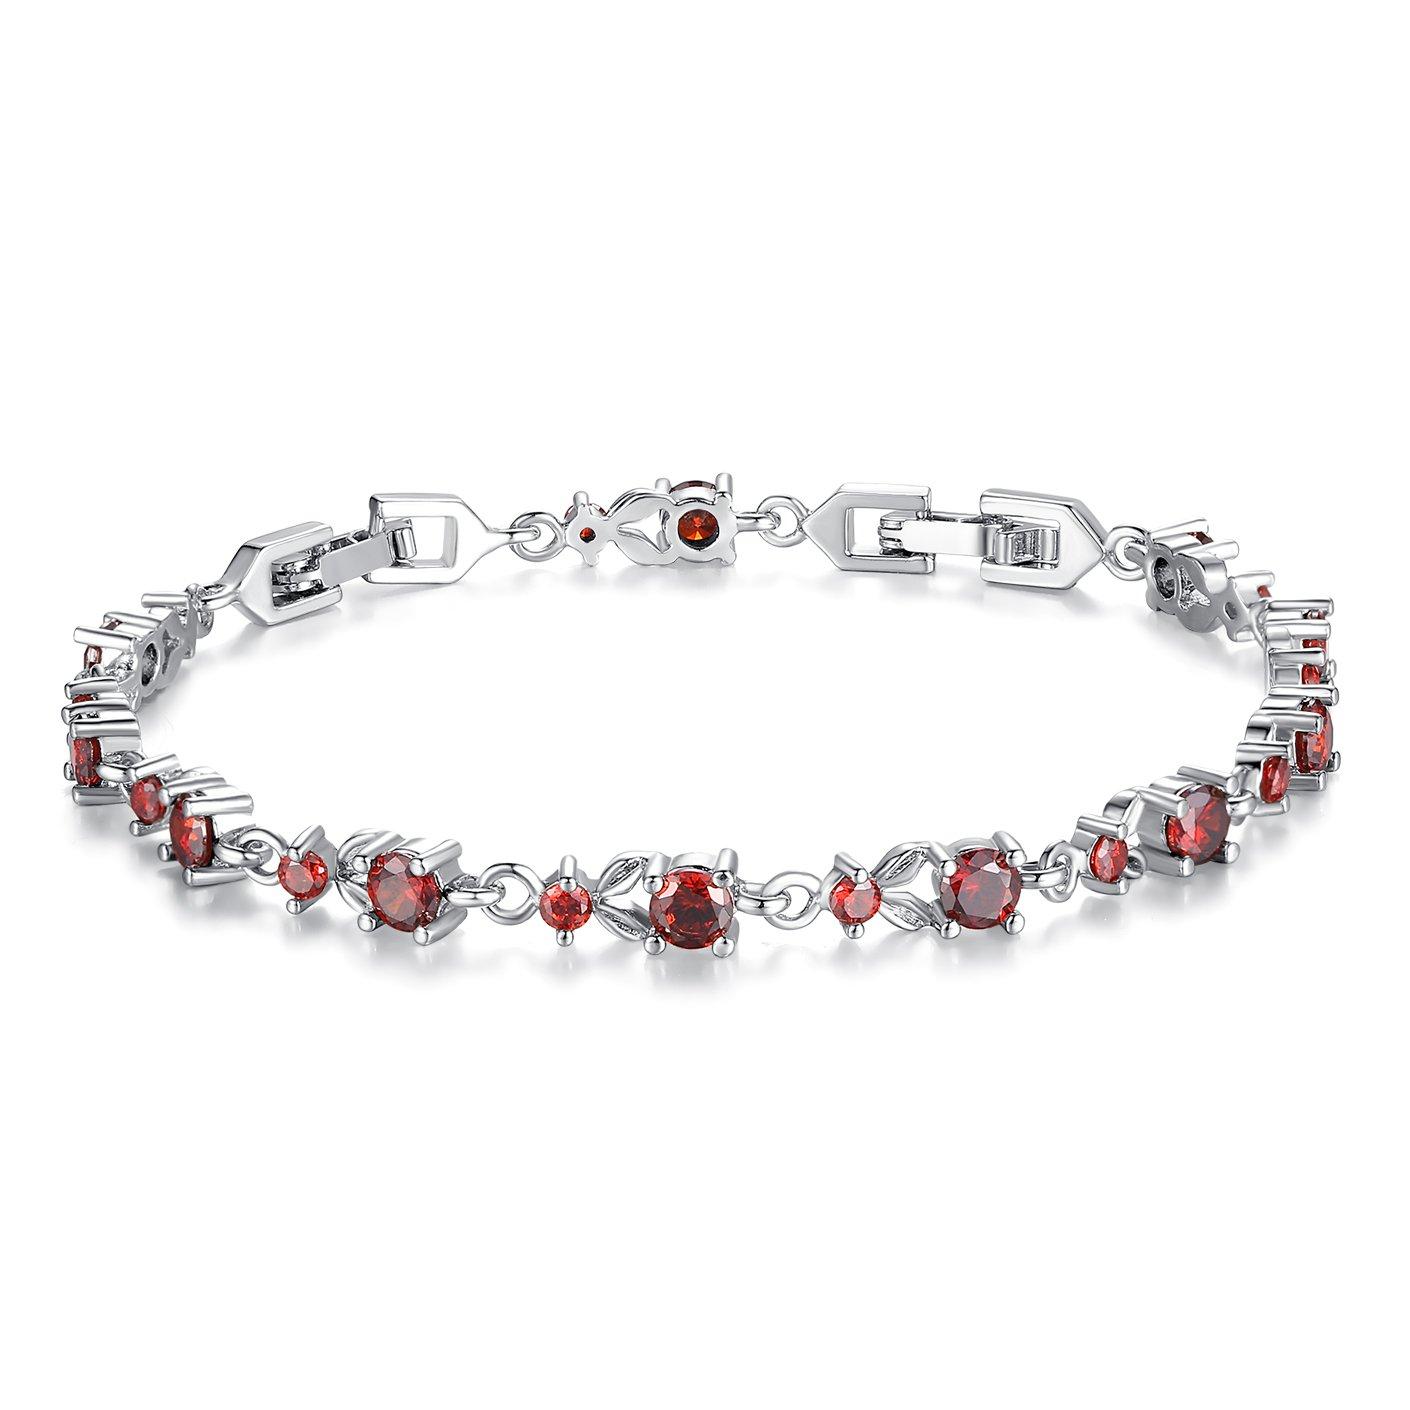 WOSTU Luxury White Gold Plated Cubic Zirconia Crystal Bracelets Women Girls Tennis Bracelets Bamoer B003-RD+BA01